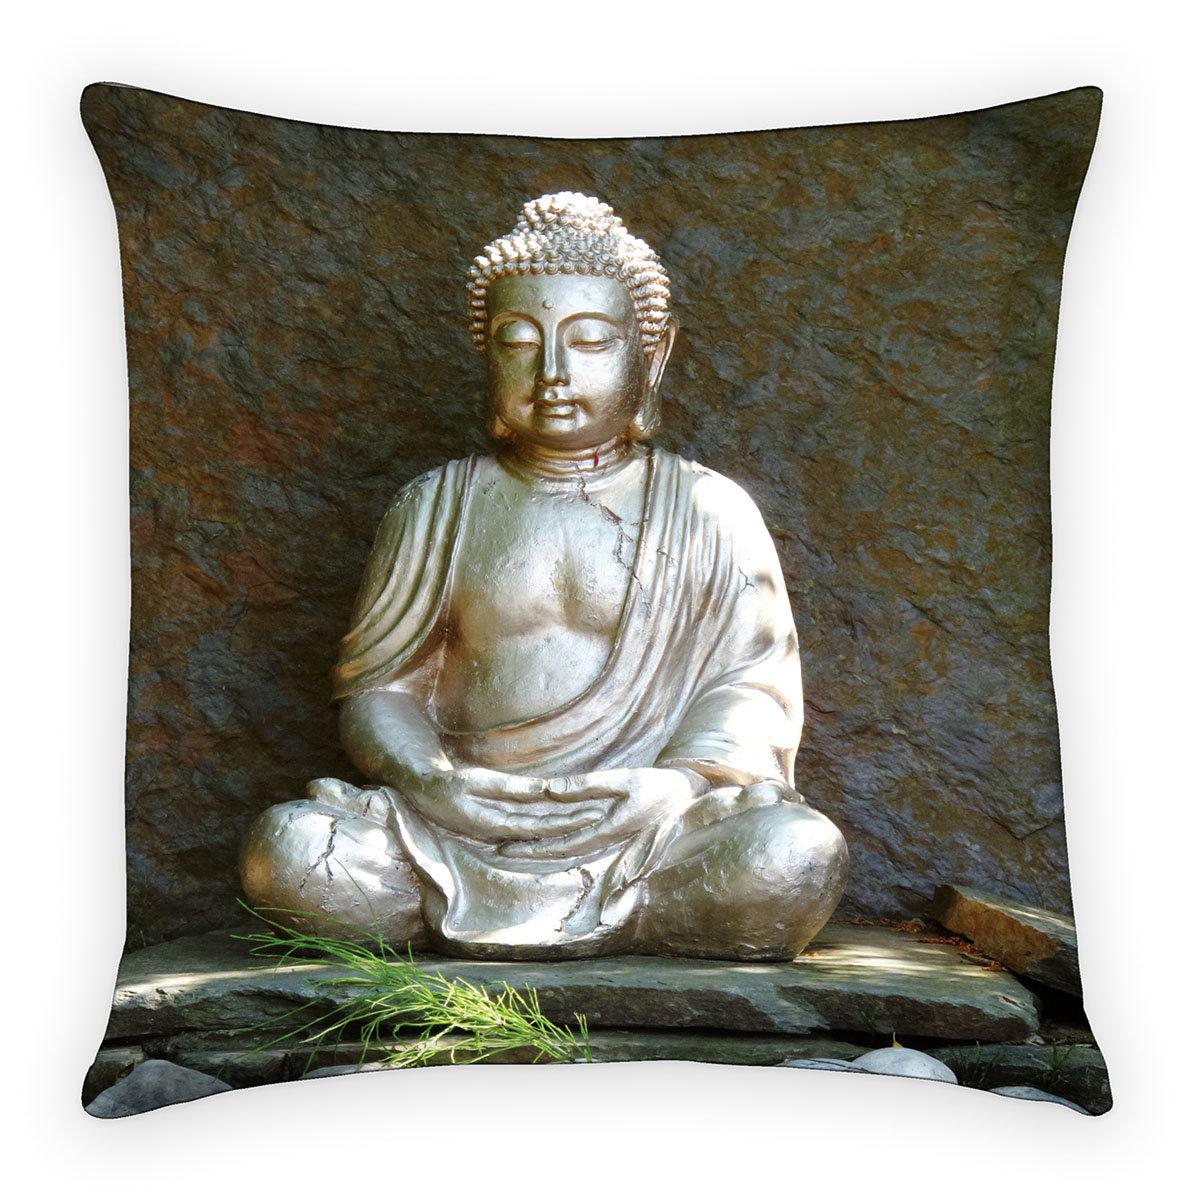 Outdoor-Kissen Buddha